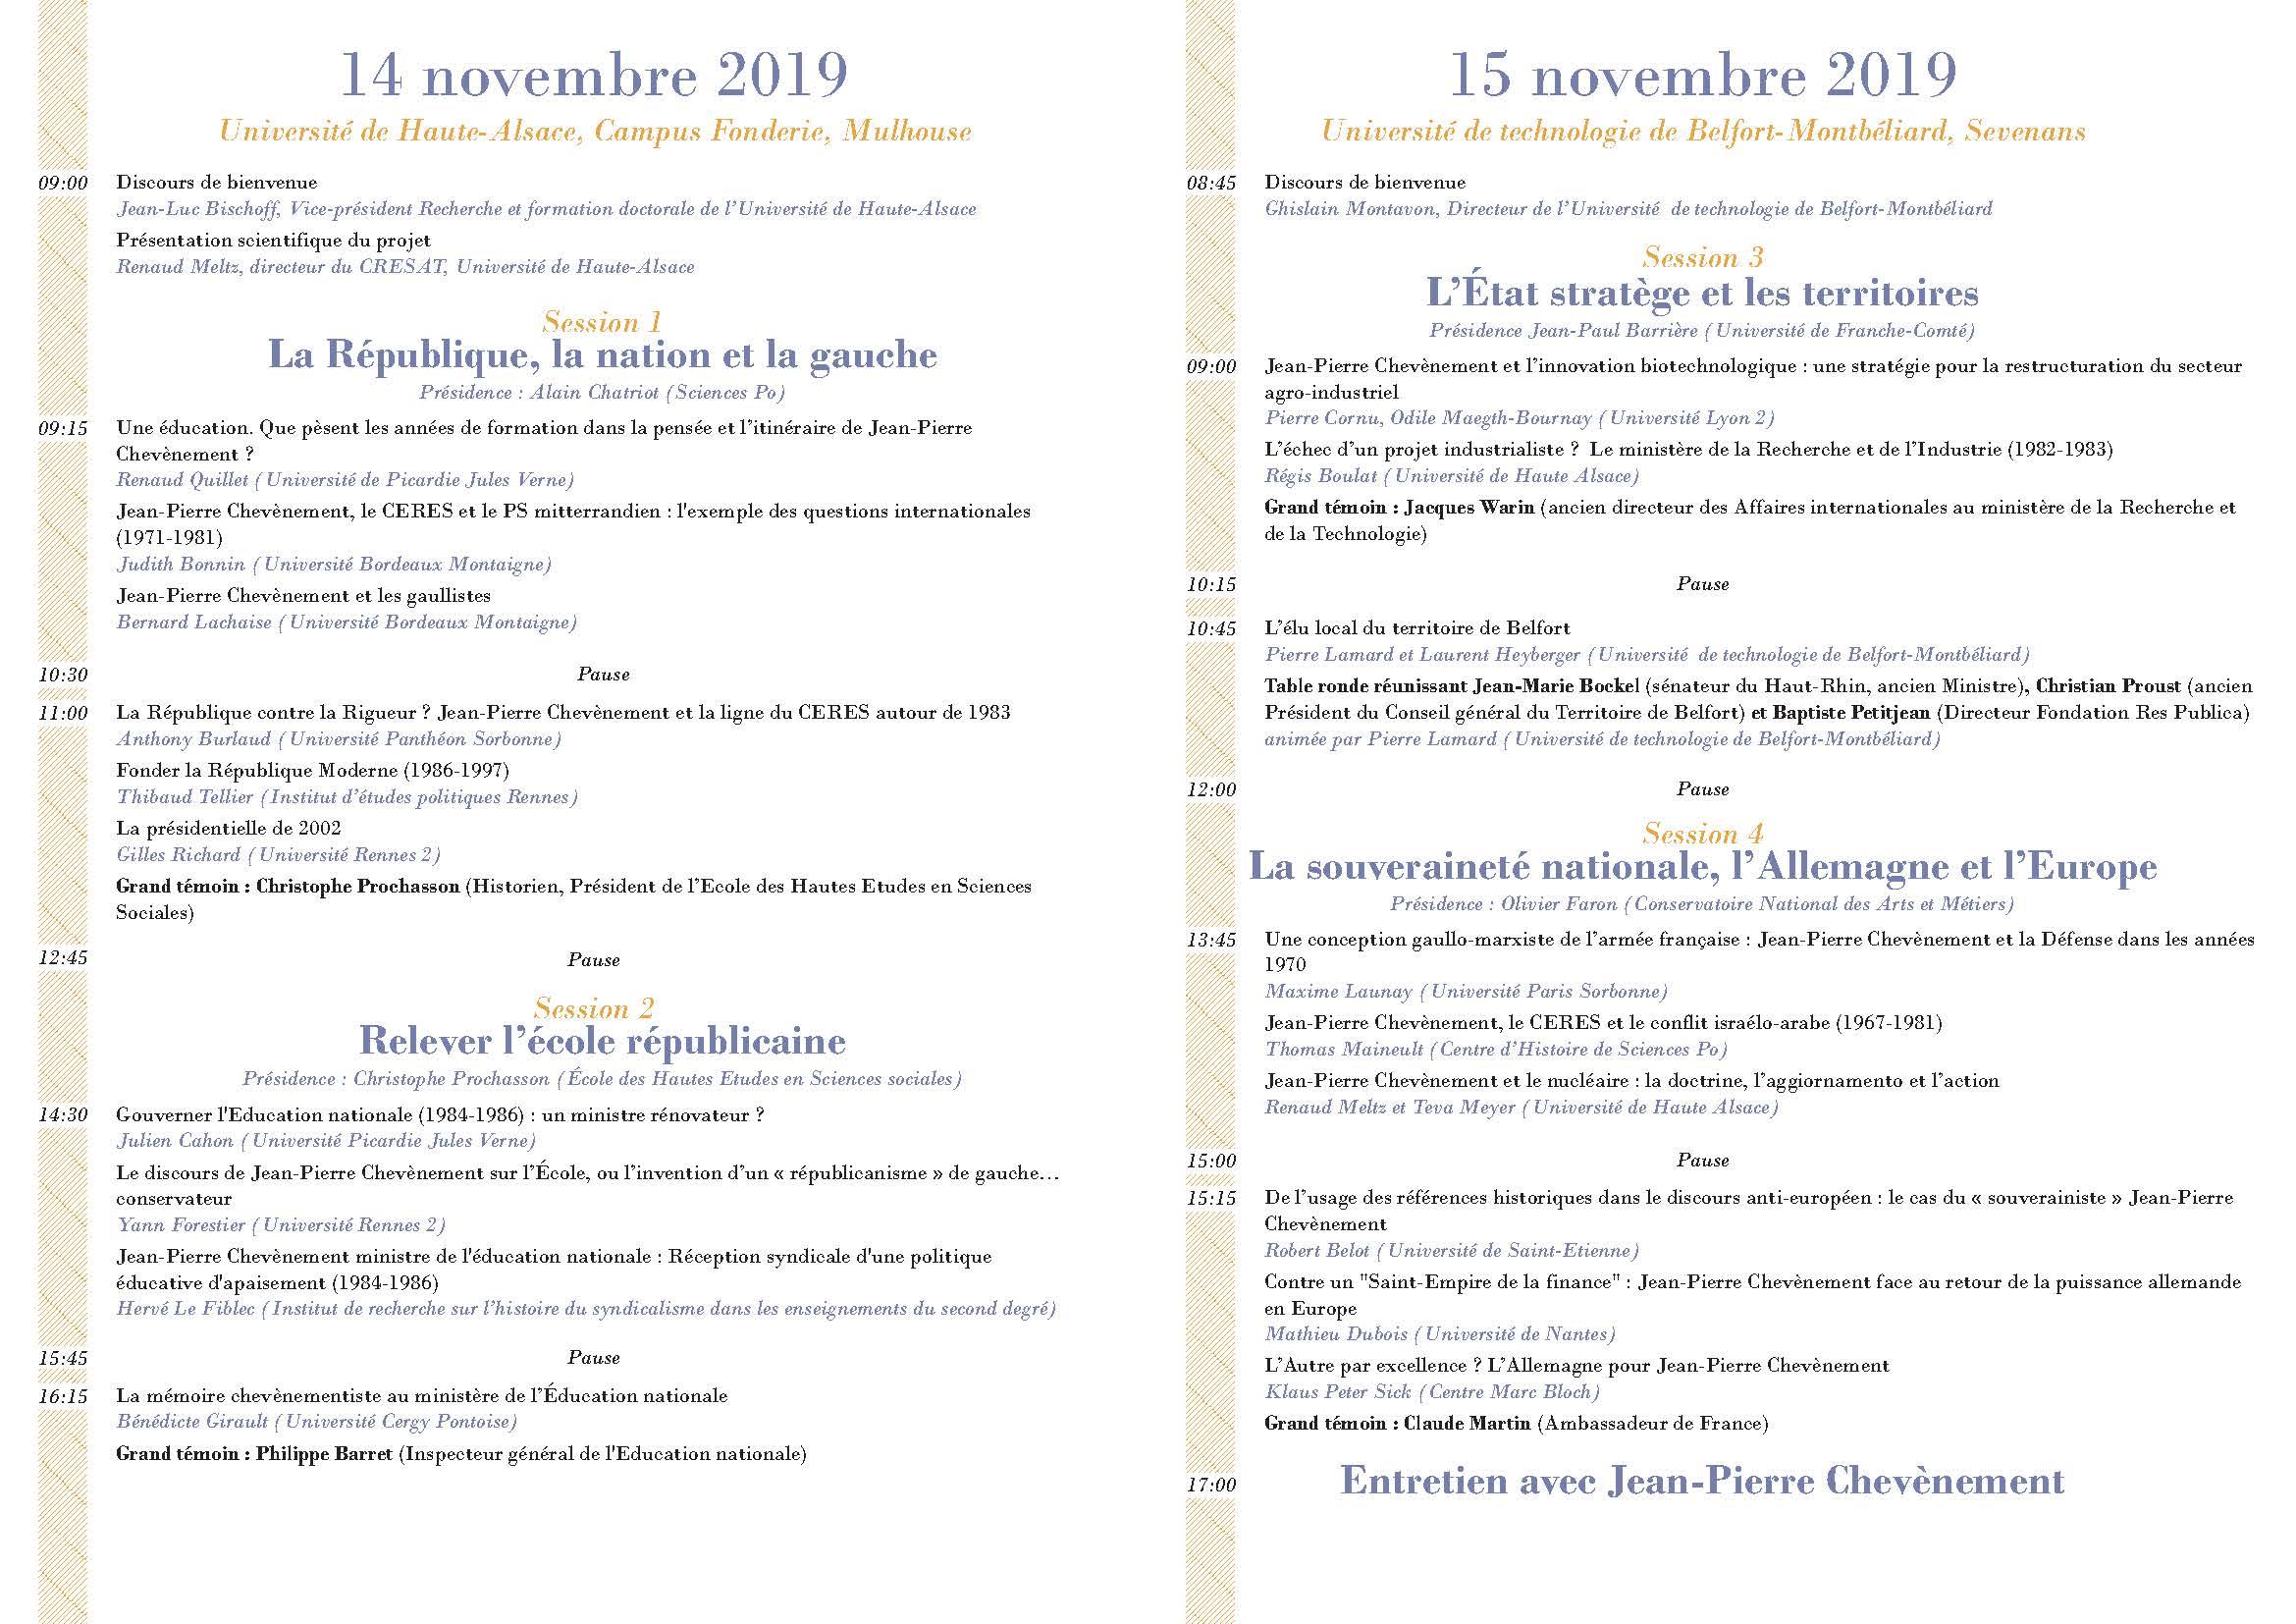 Programme JPC